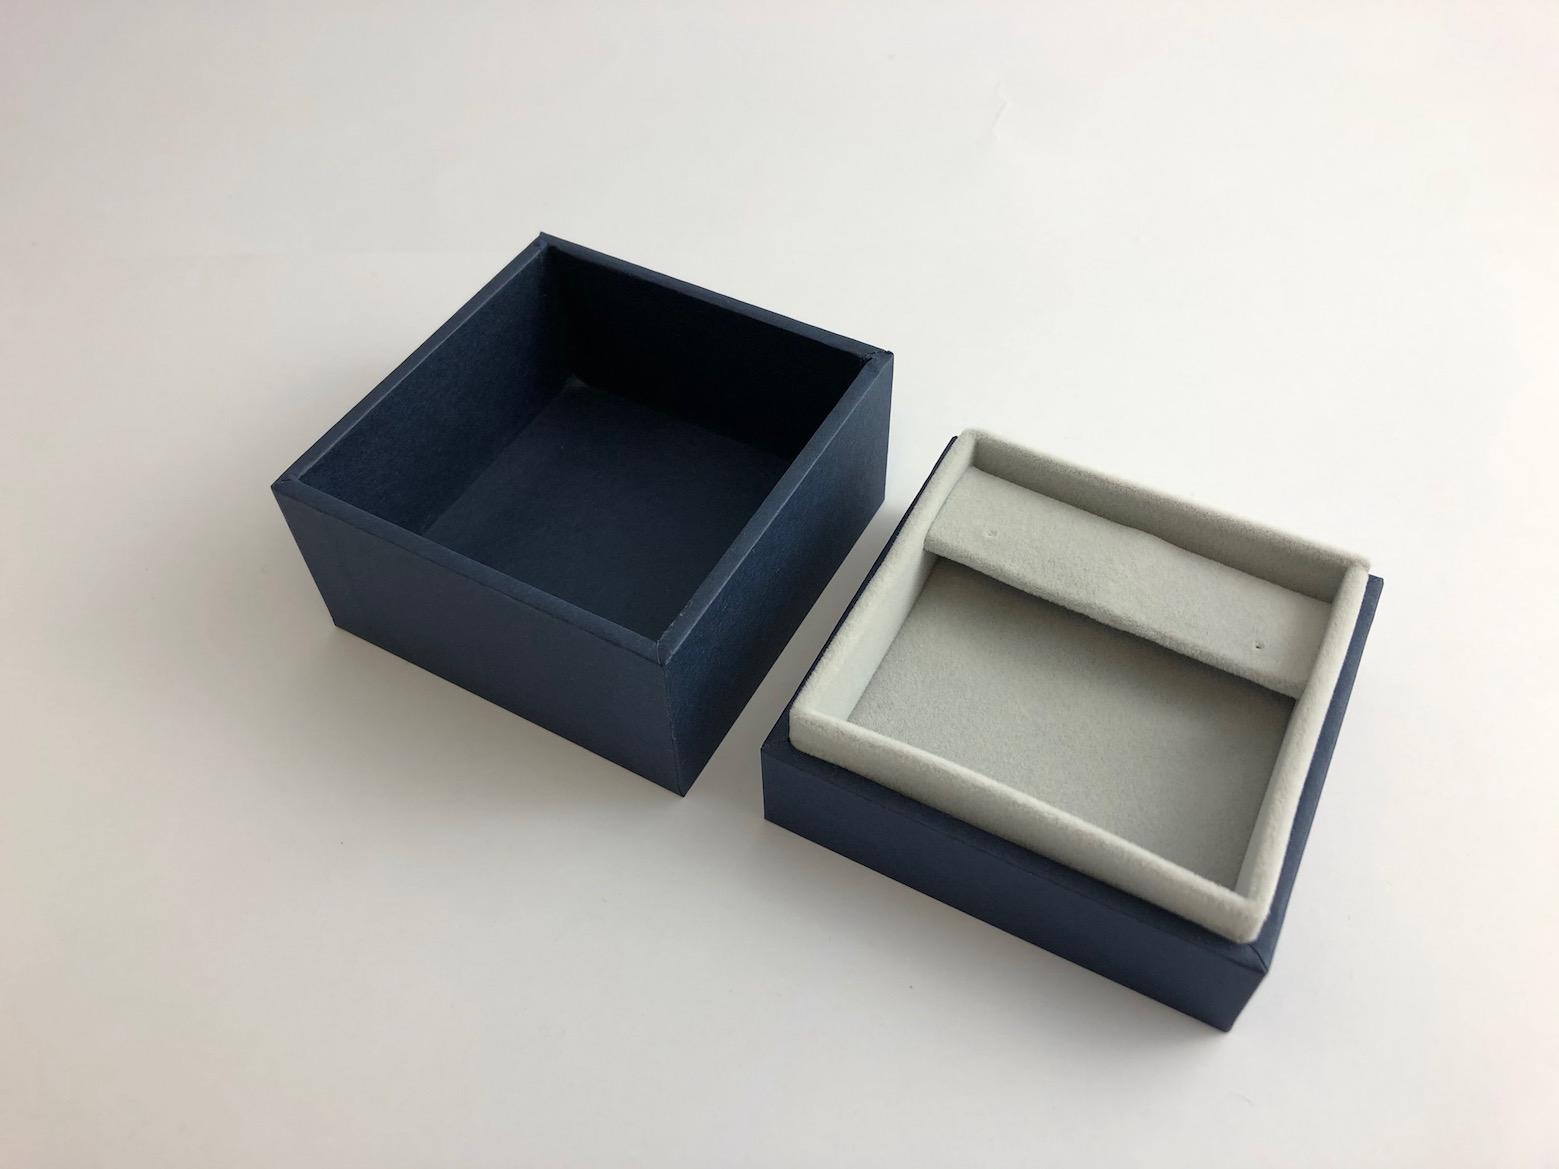 New Blue Envy Large Drop Earring Box